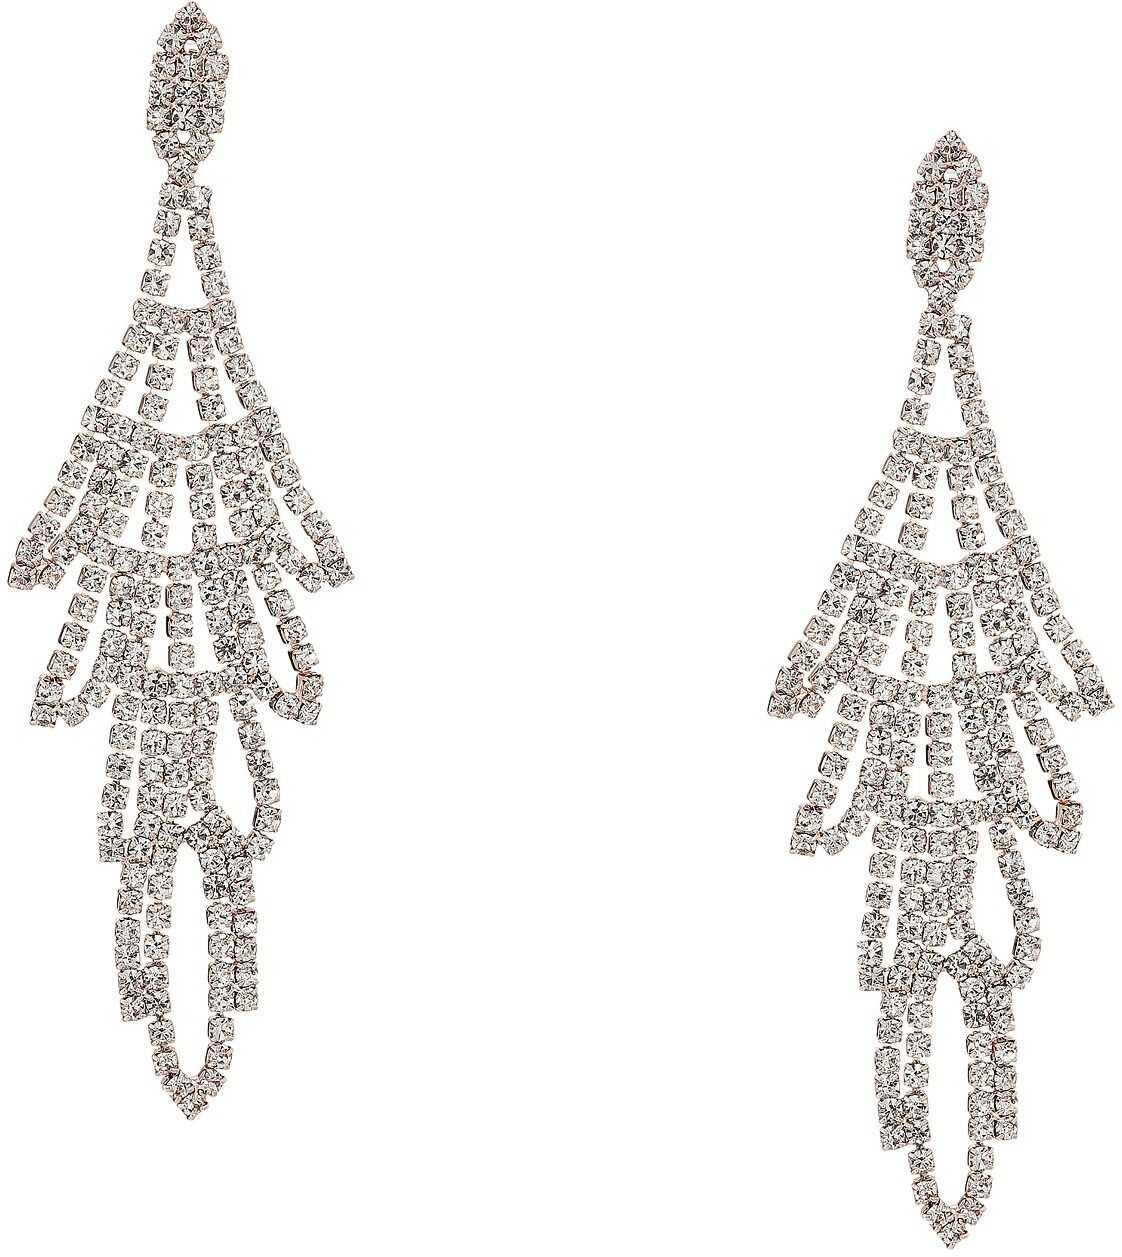 GUESS Rhinestone Chandelier Drop Earrings Crystal Rose Gold